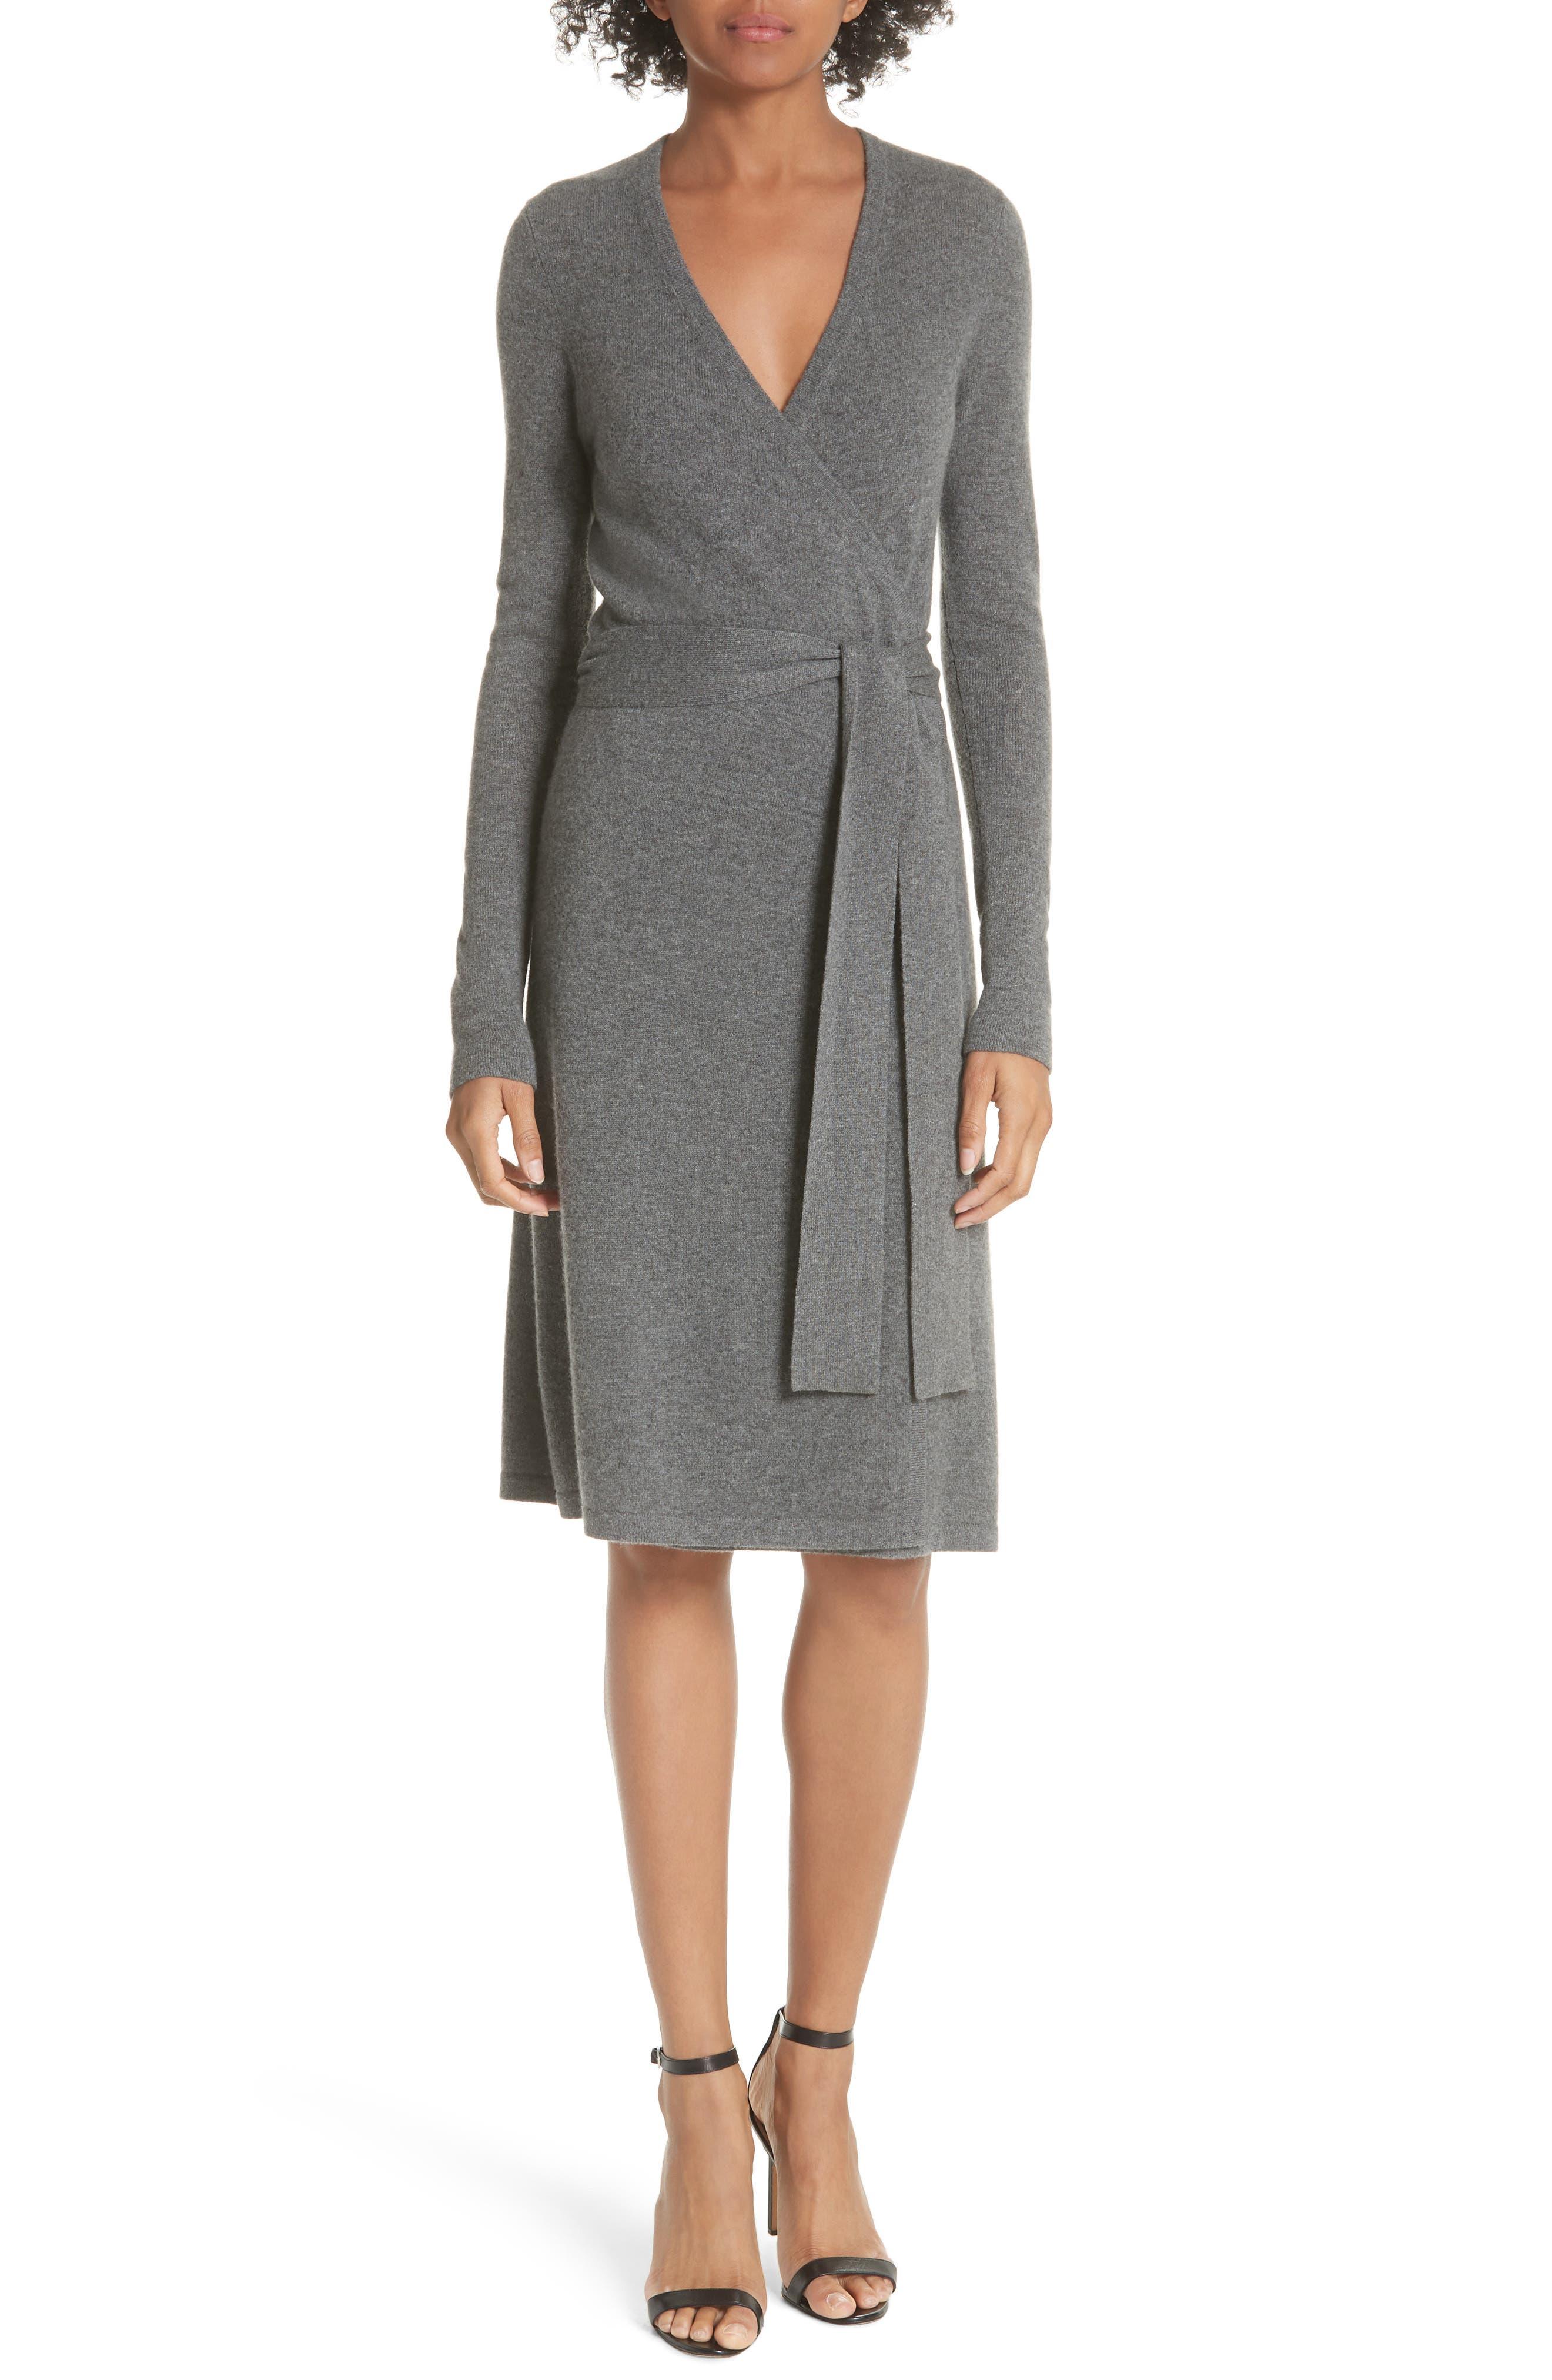 Diane Von Furstenberg Linda Cashmere Wrap Dress,                             Main thumbnail 1, color,                             Charcoal Melange